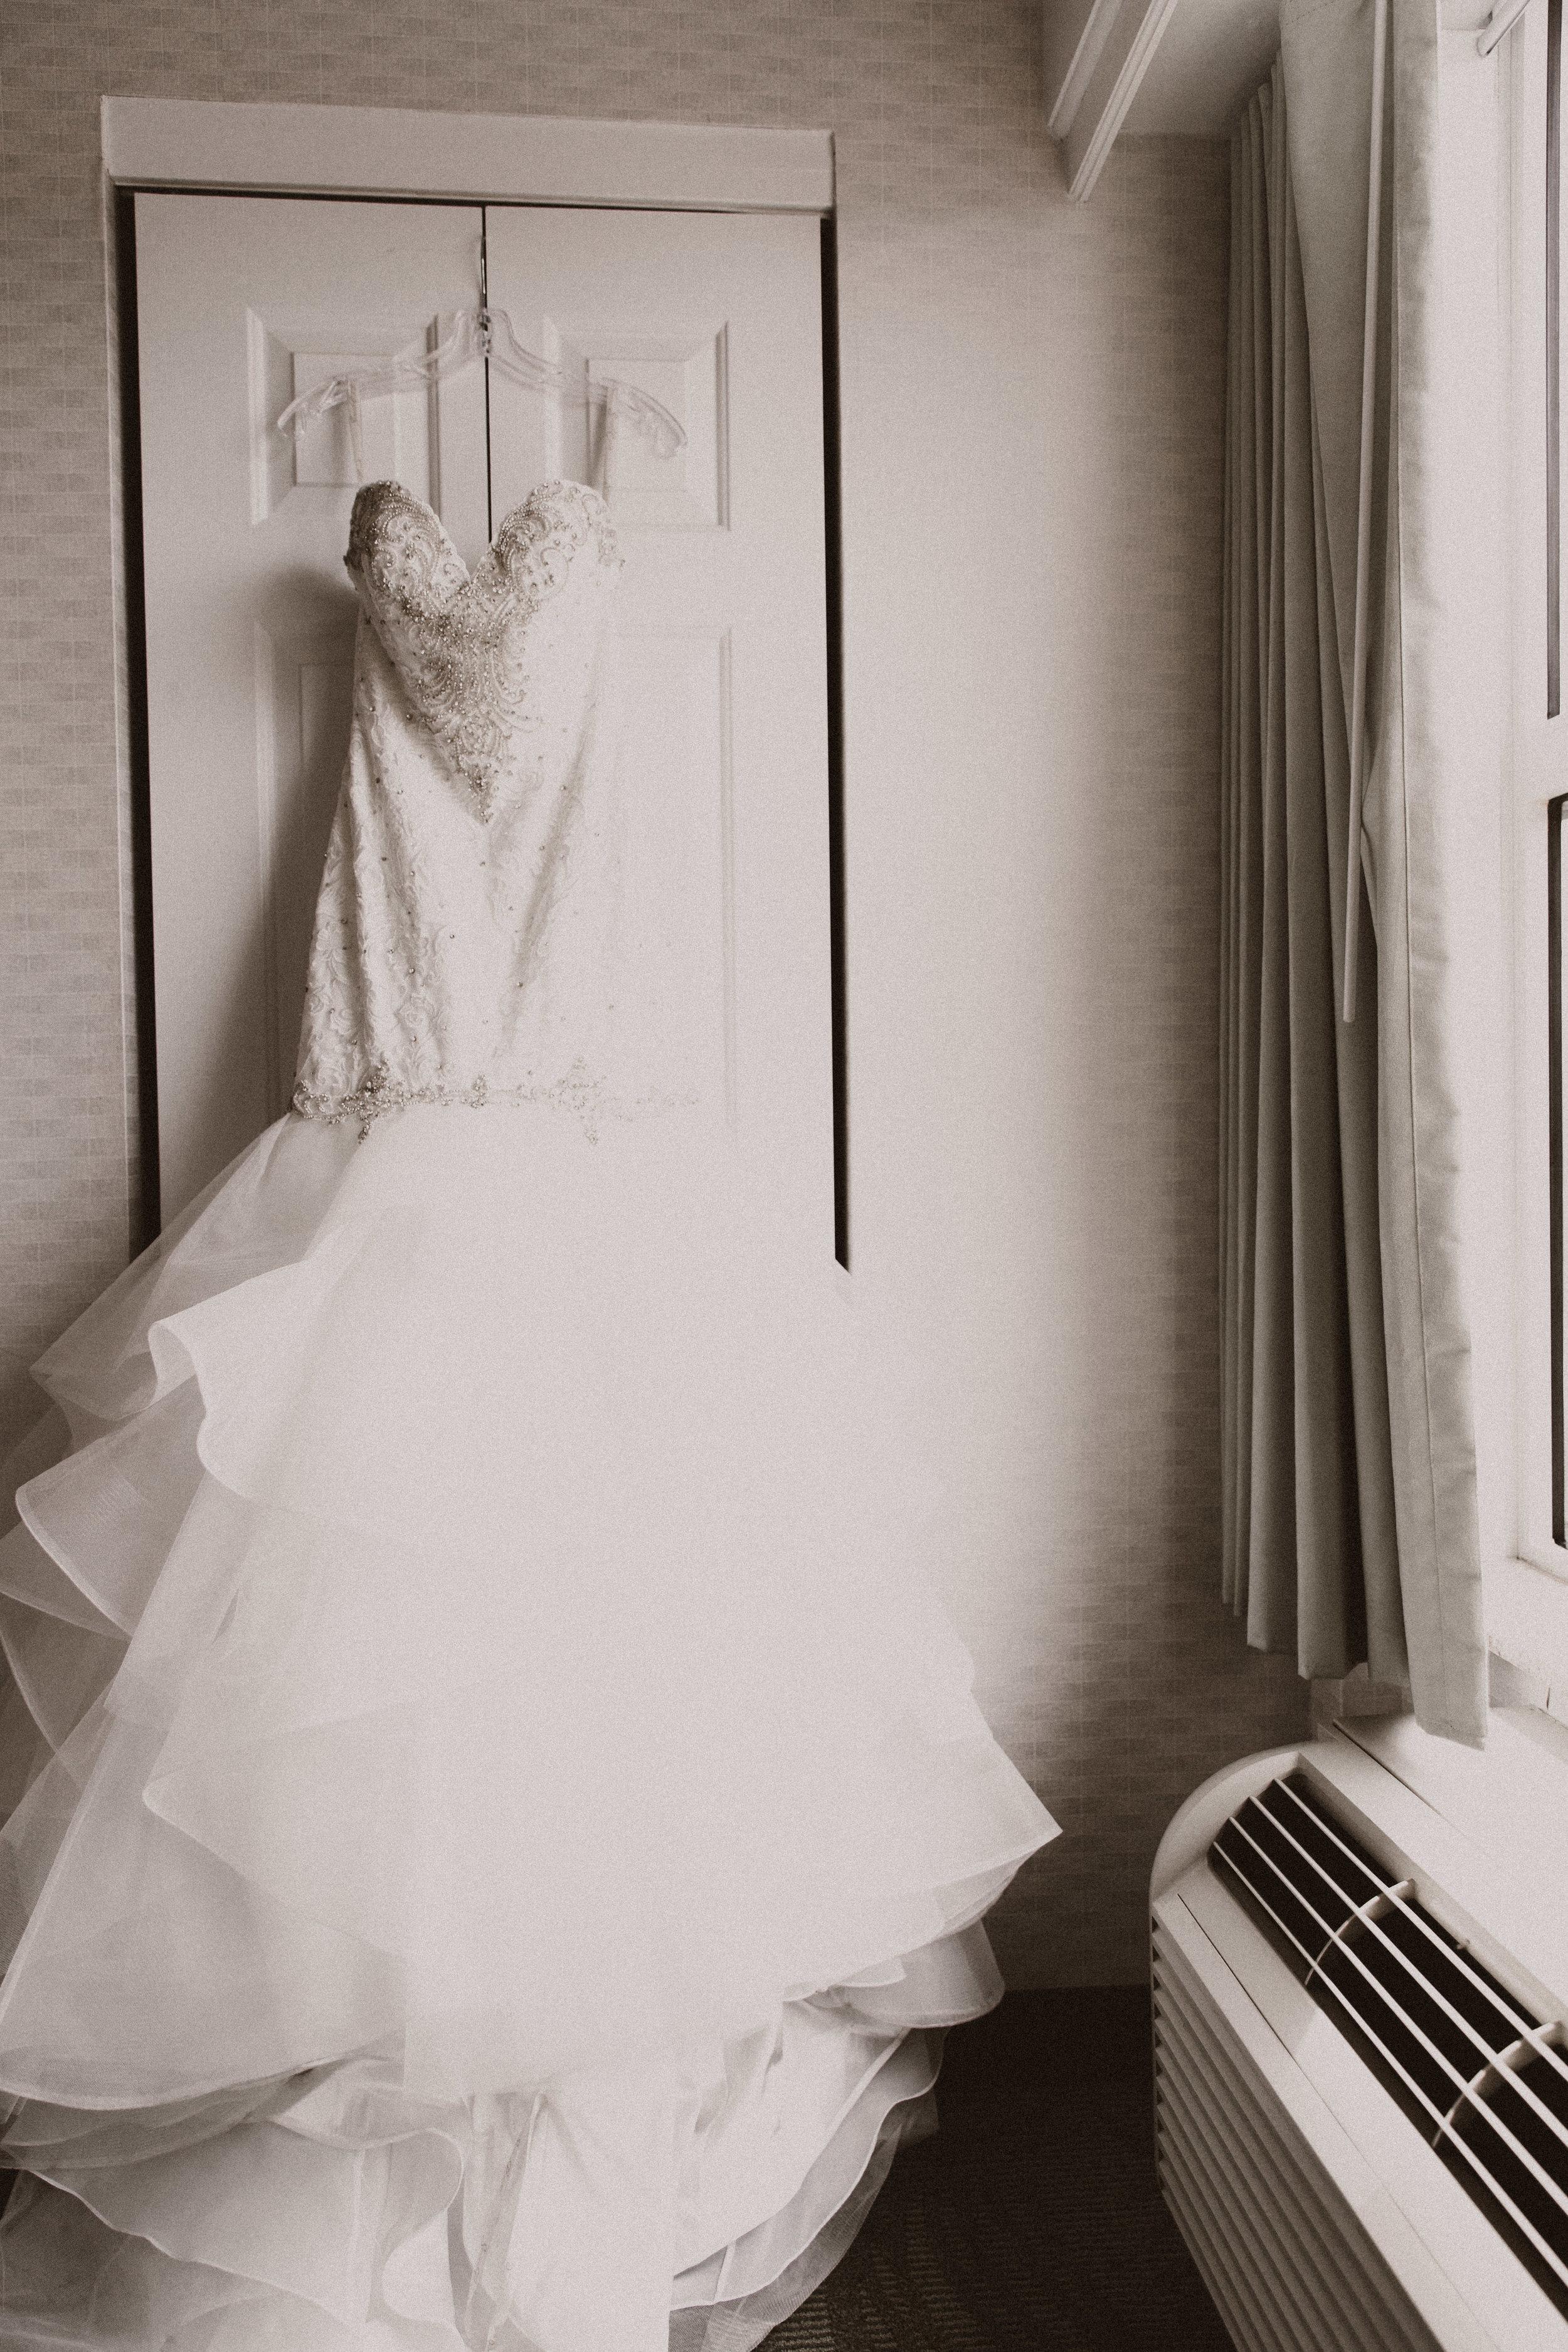 BUTLER, PA WEDDING PHOTOGRAPHER - 5W7A2975.jpg